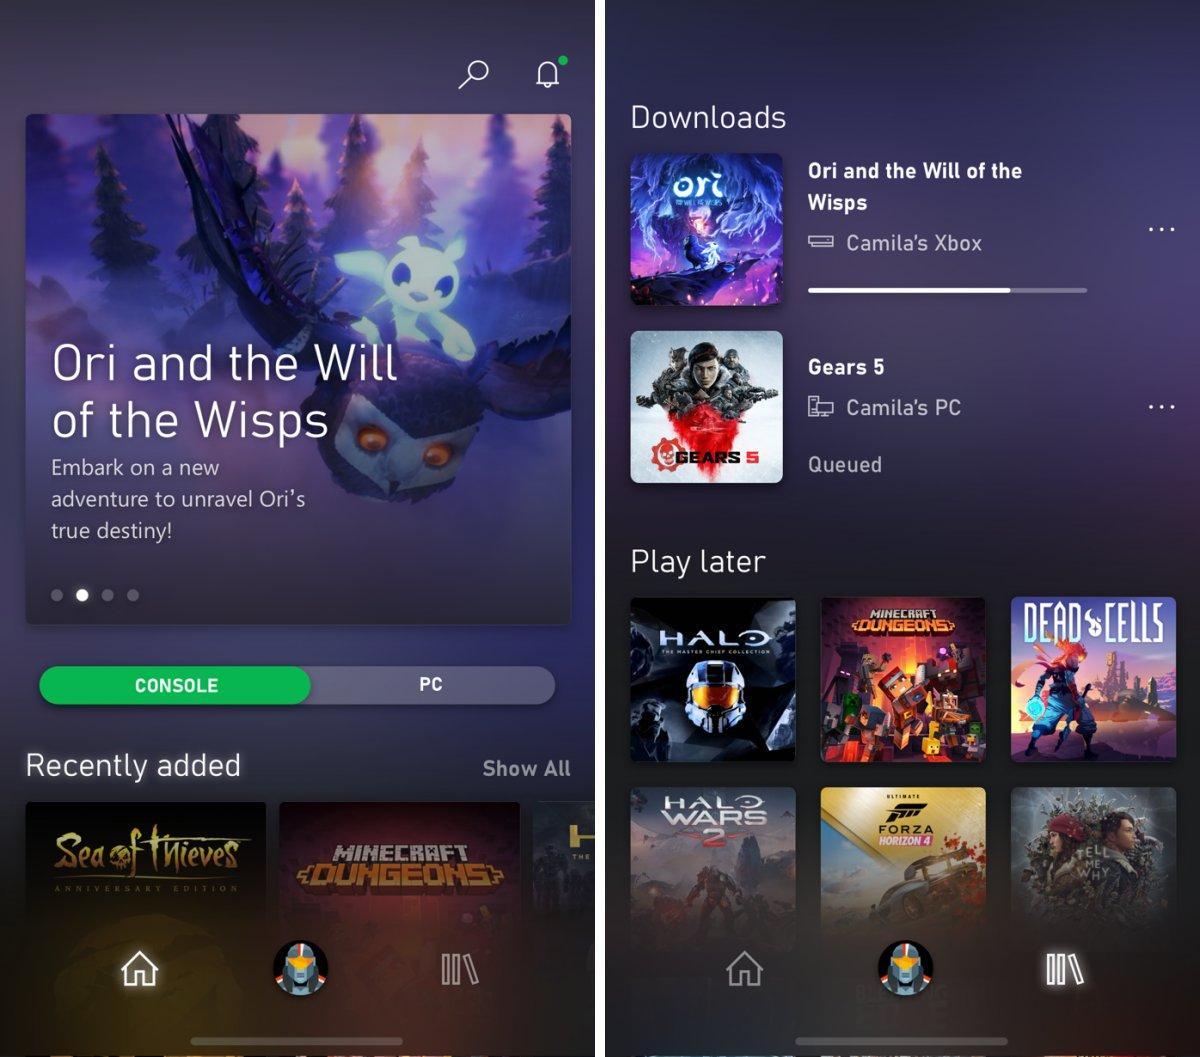 Xbox Game Pass Capture Zee iPad iPhone iPod